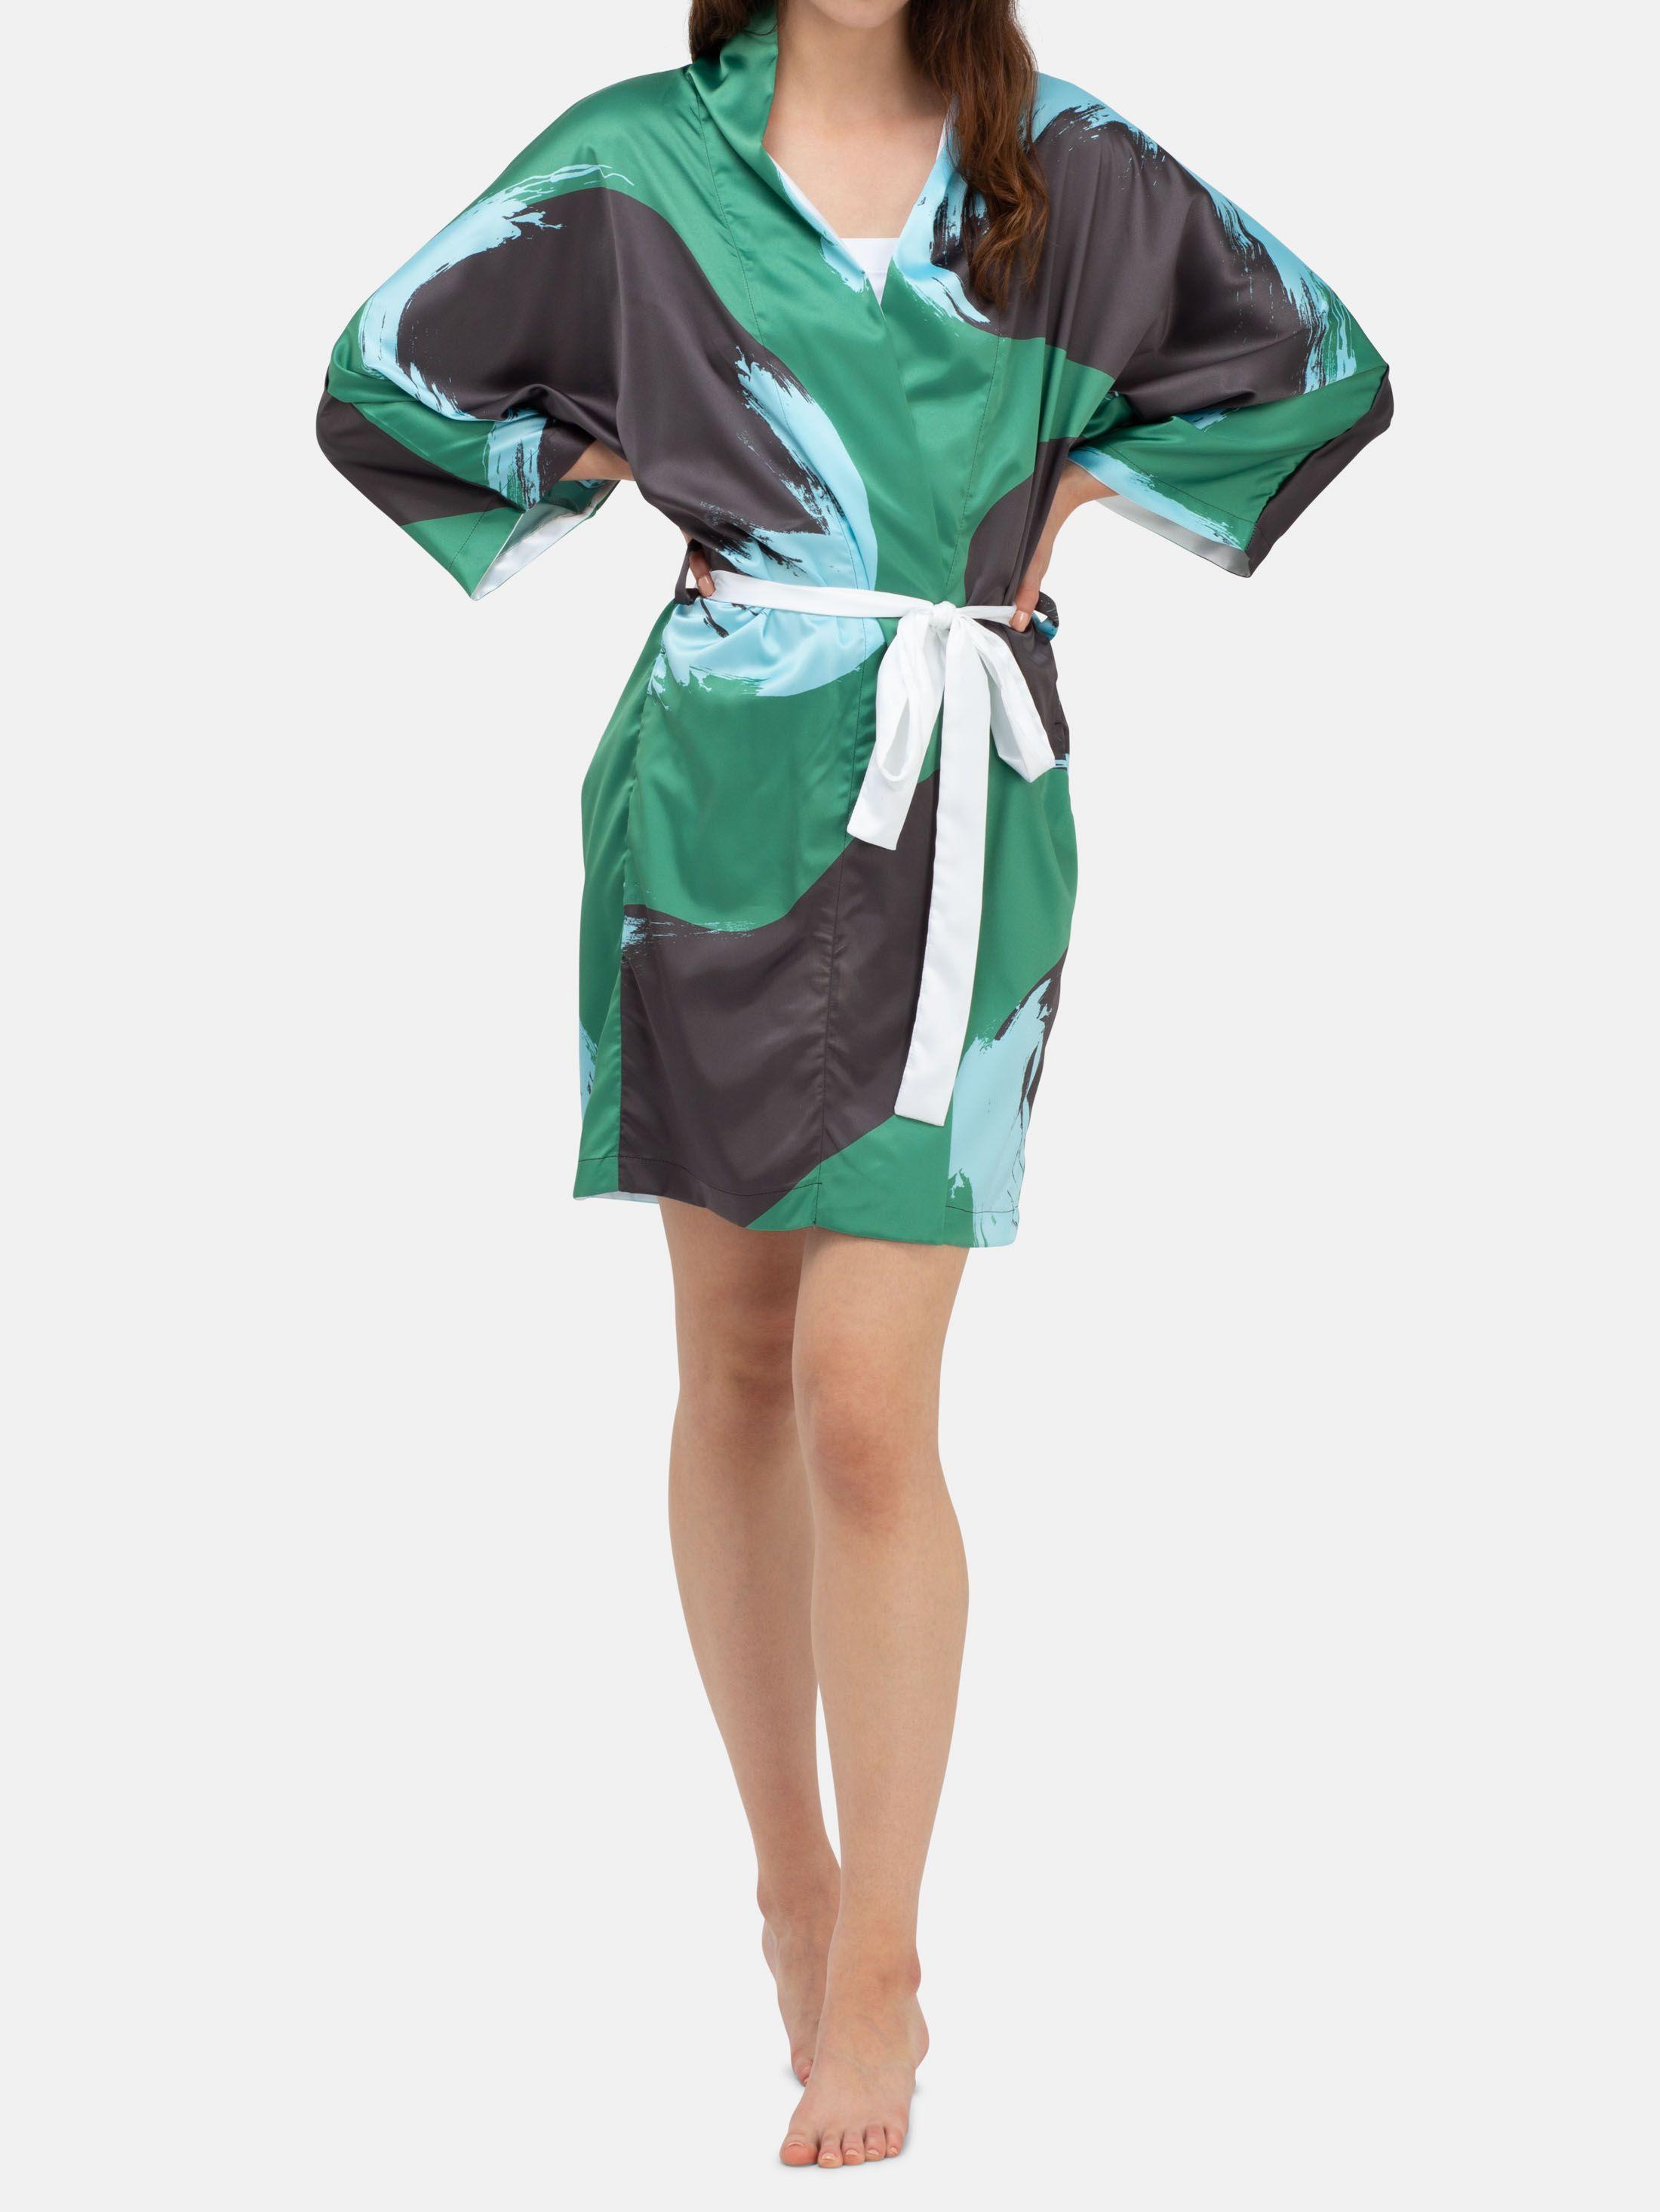 Kimono personalizado